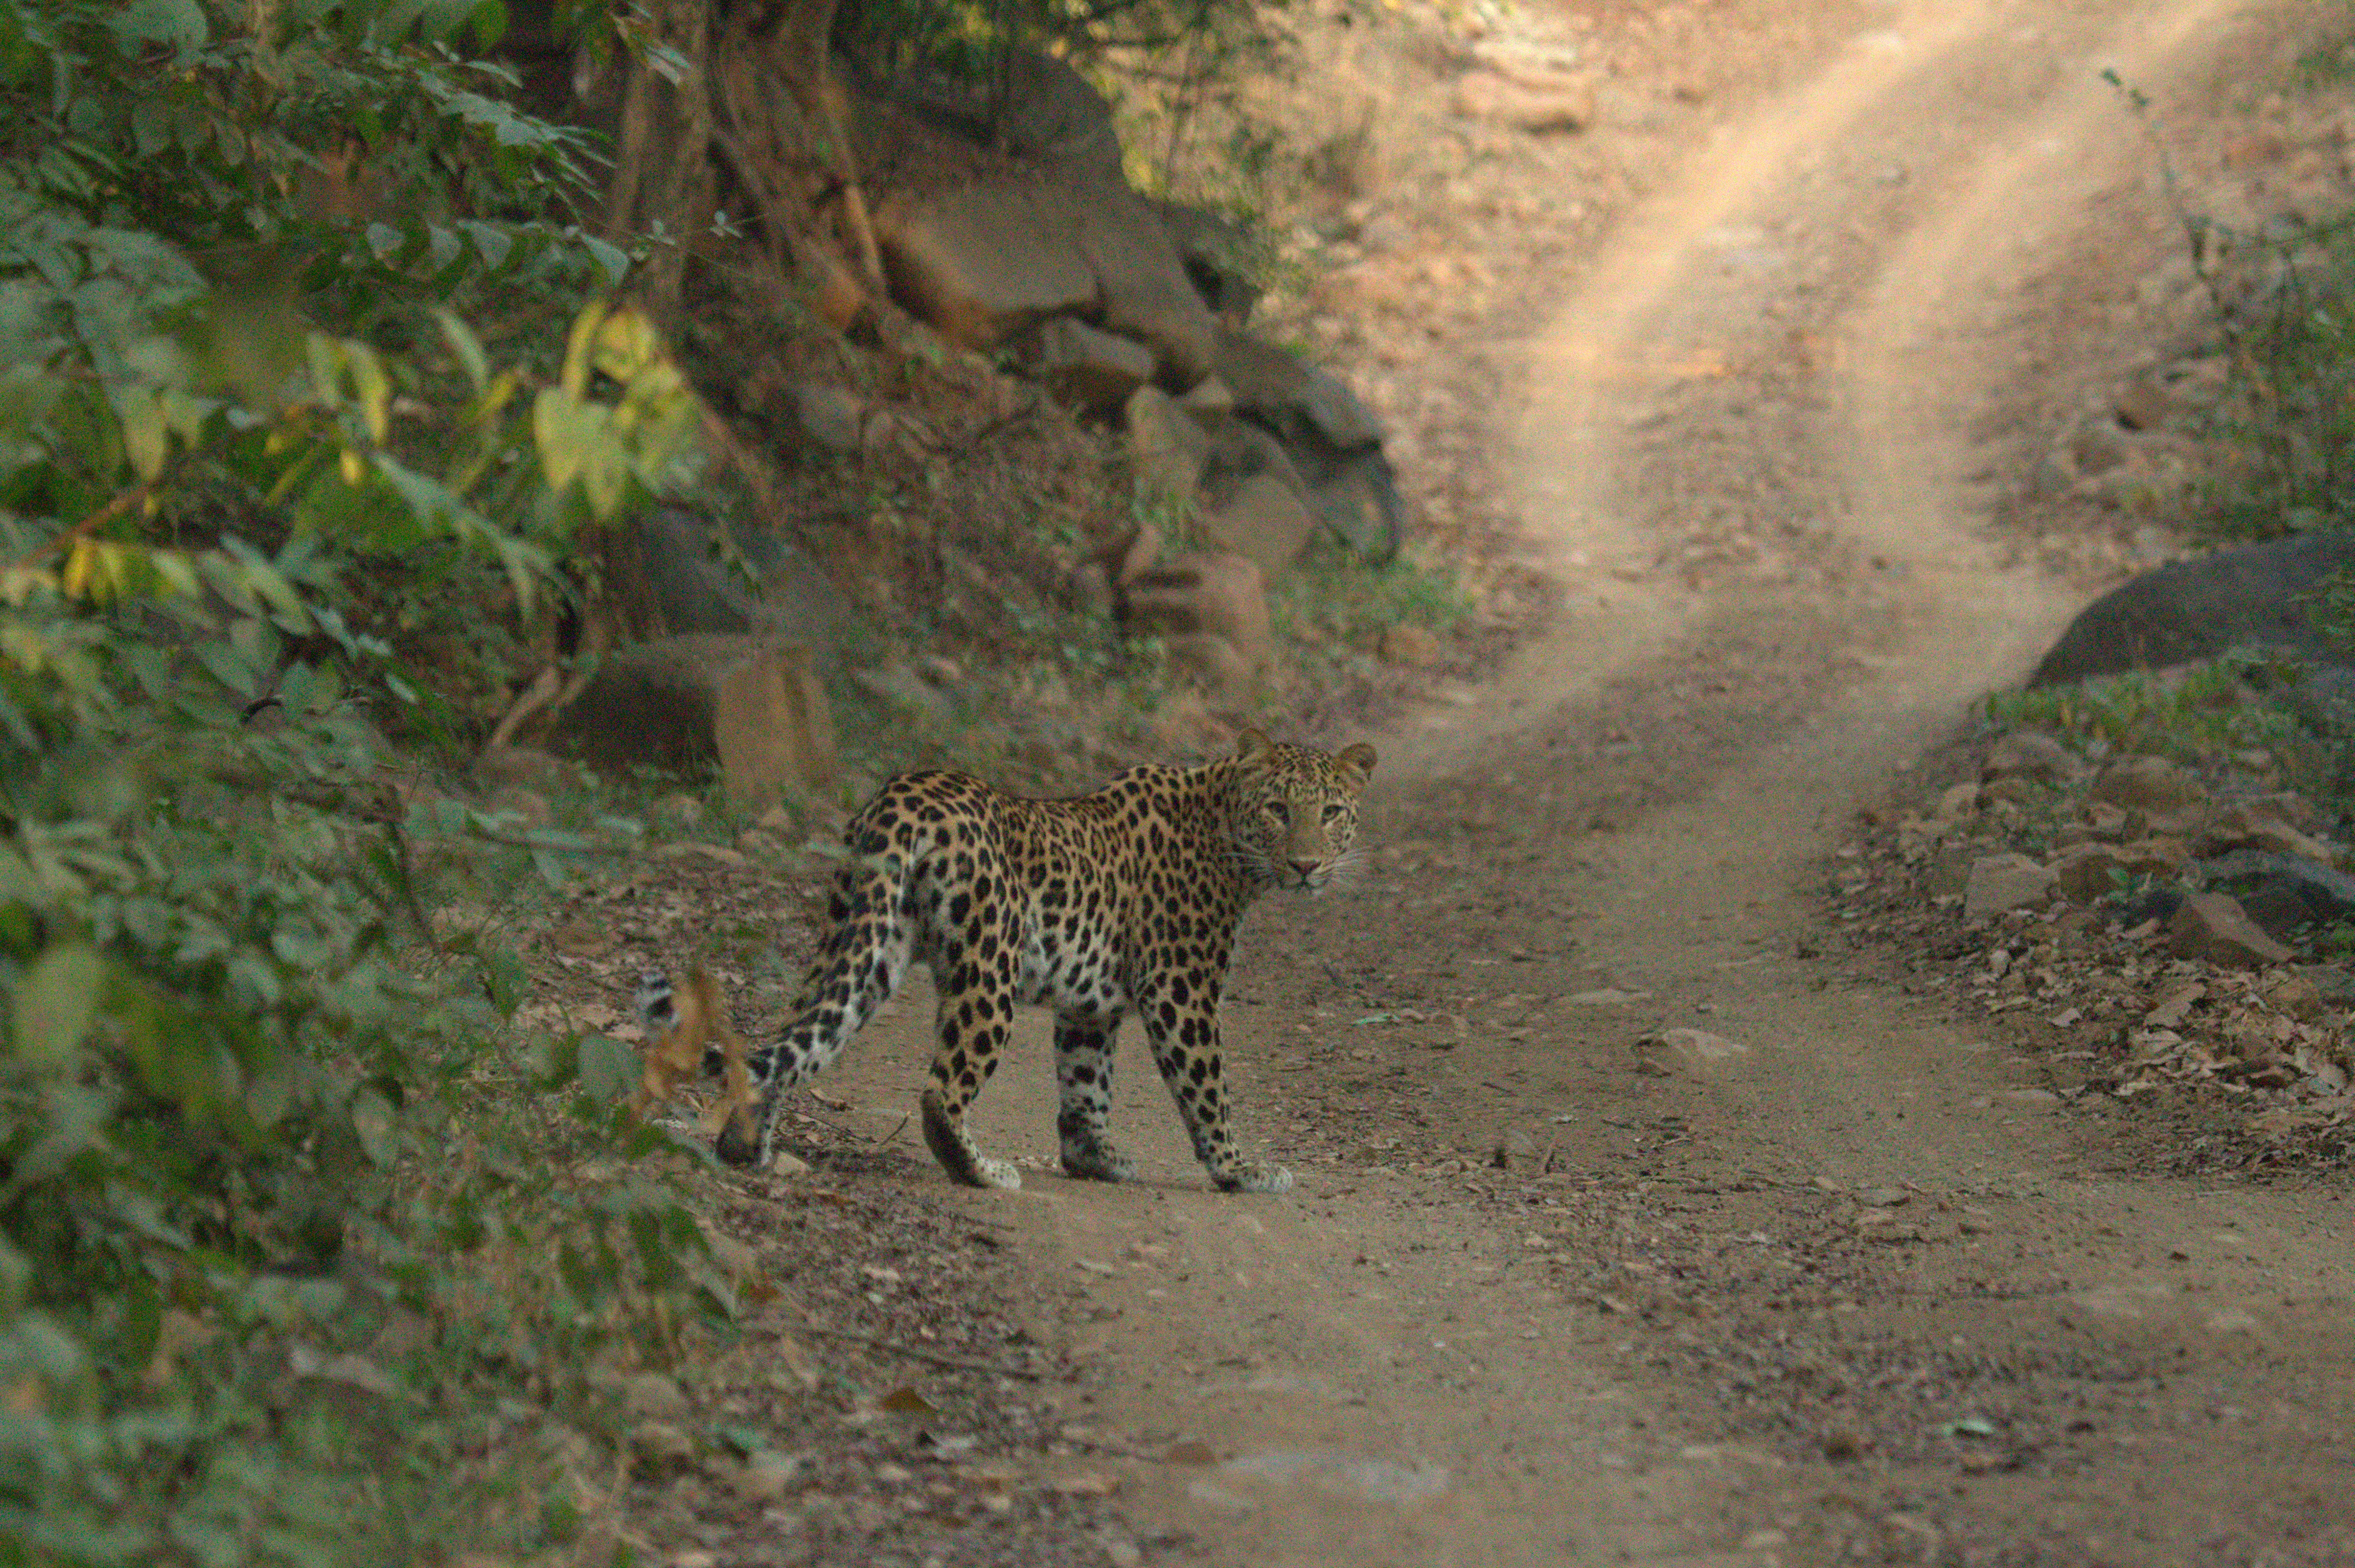 Leopard in Ranthambhore National Park